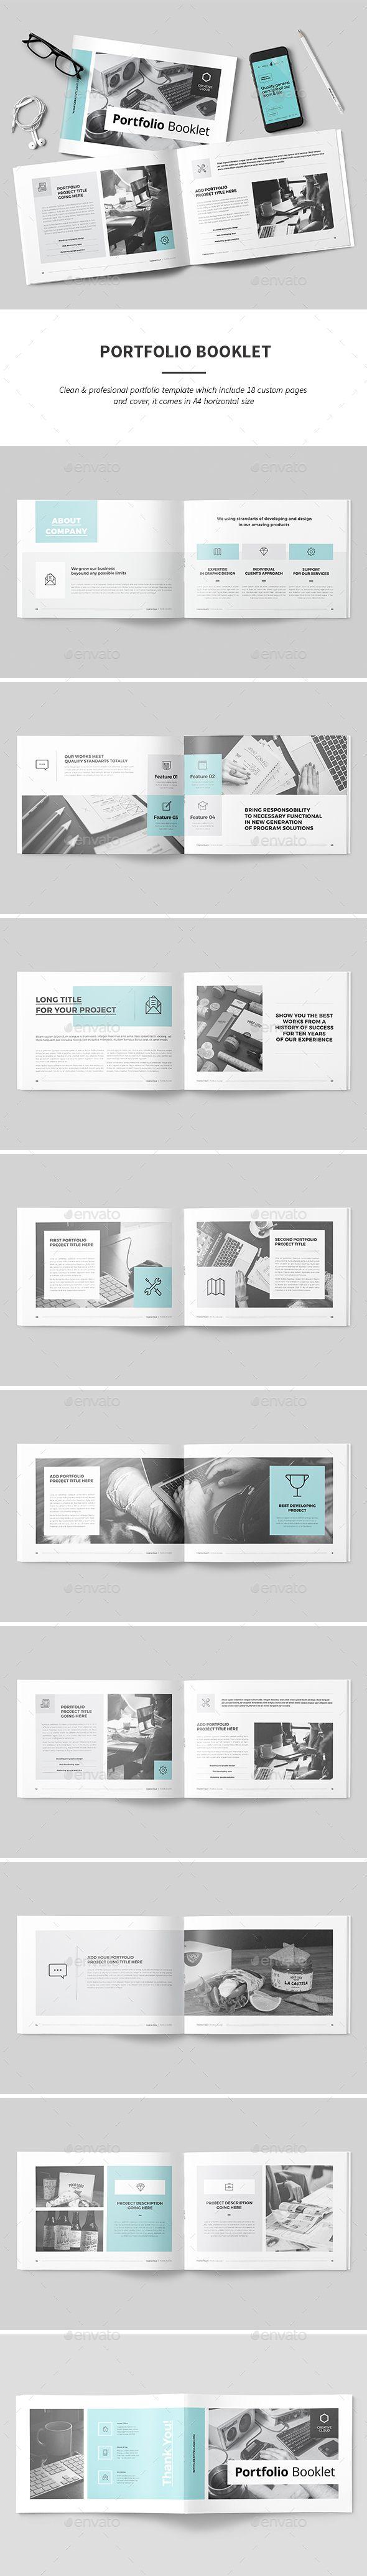 Portfolio — InDesign INDD #210x297 #portfolio • Download ➝ https://graphicriver.net/item/portfolio/18850600?ref=pxcr